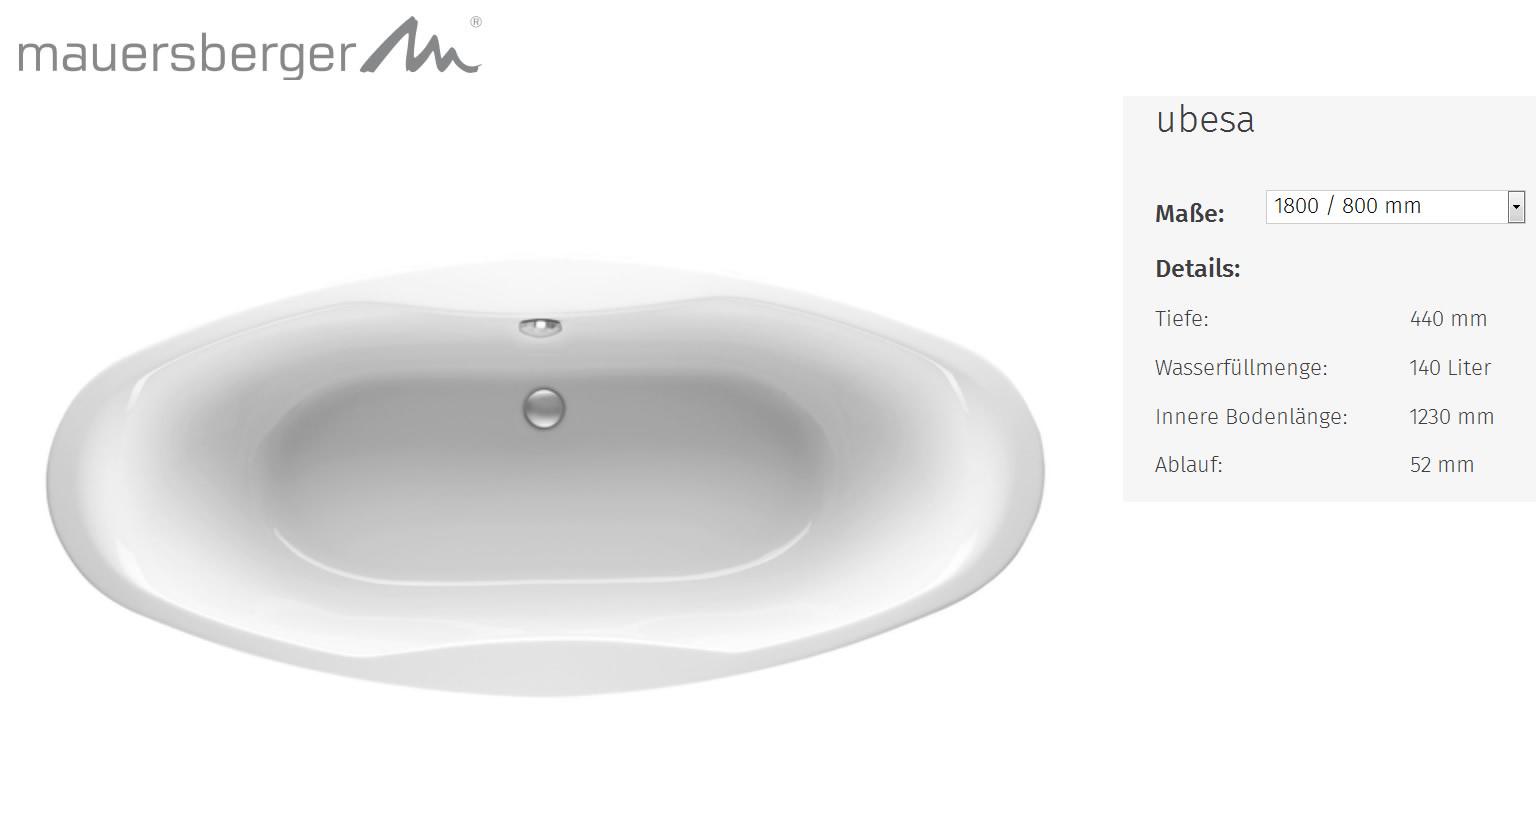 Mauersberger Badewanne Ubesa 180 X 80 Cm Acryl Oval Impulsbad